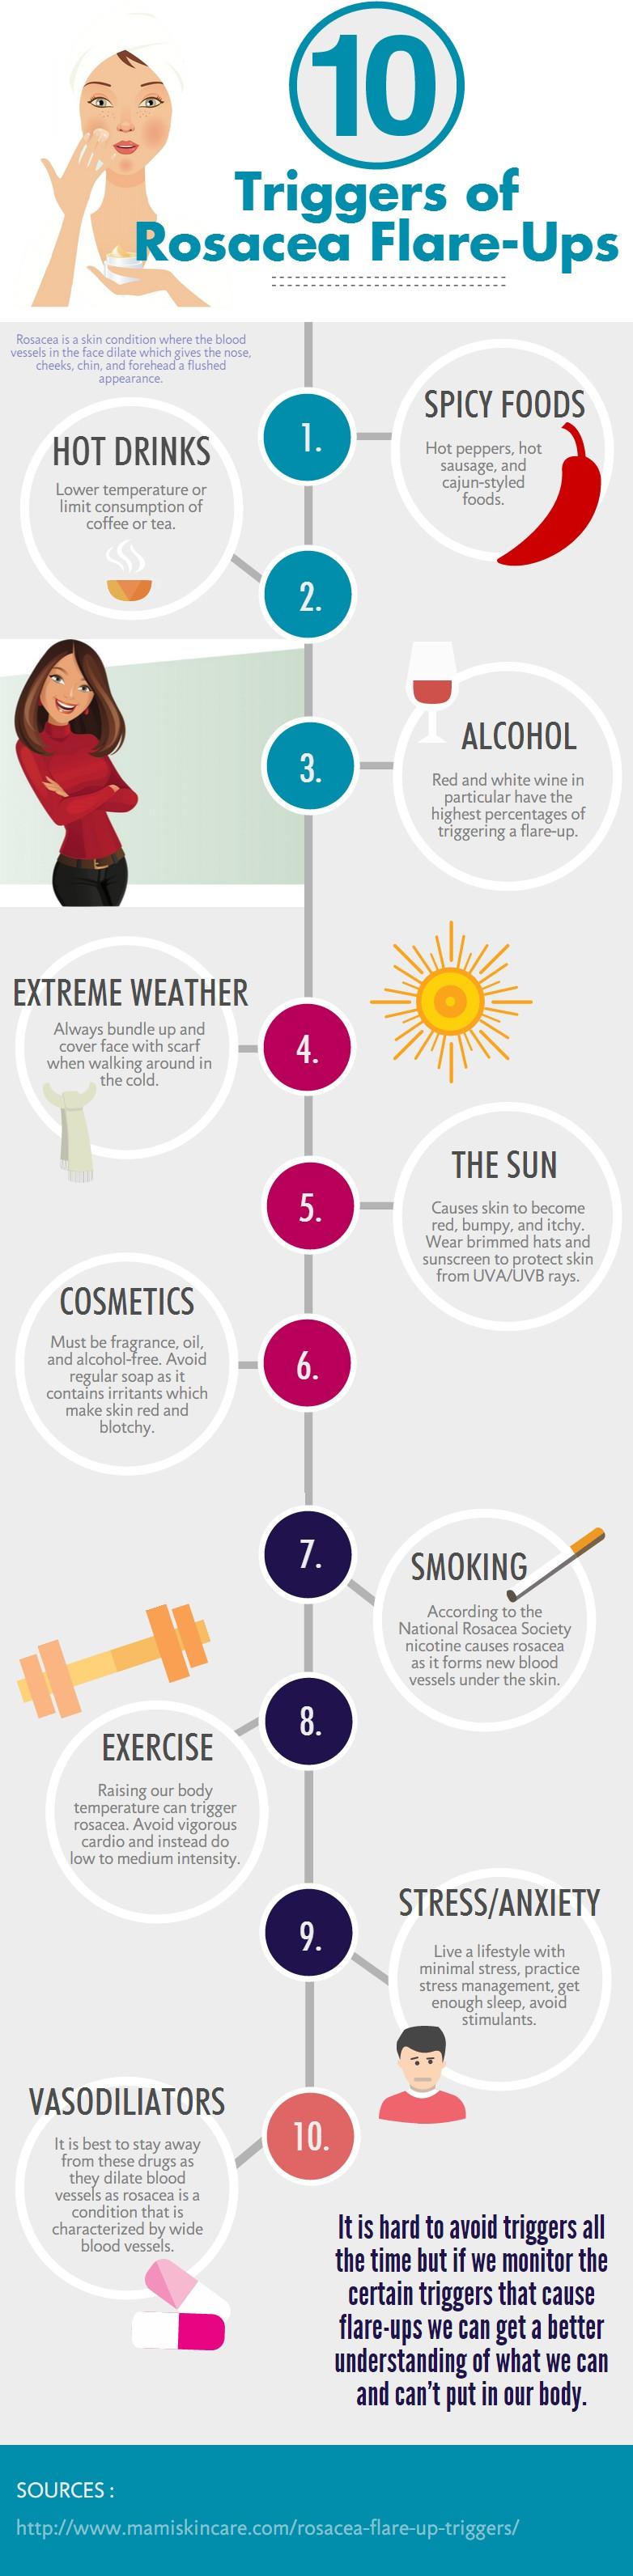 10 triggers of rosacea flareups